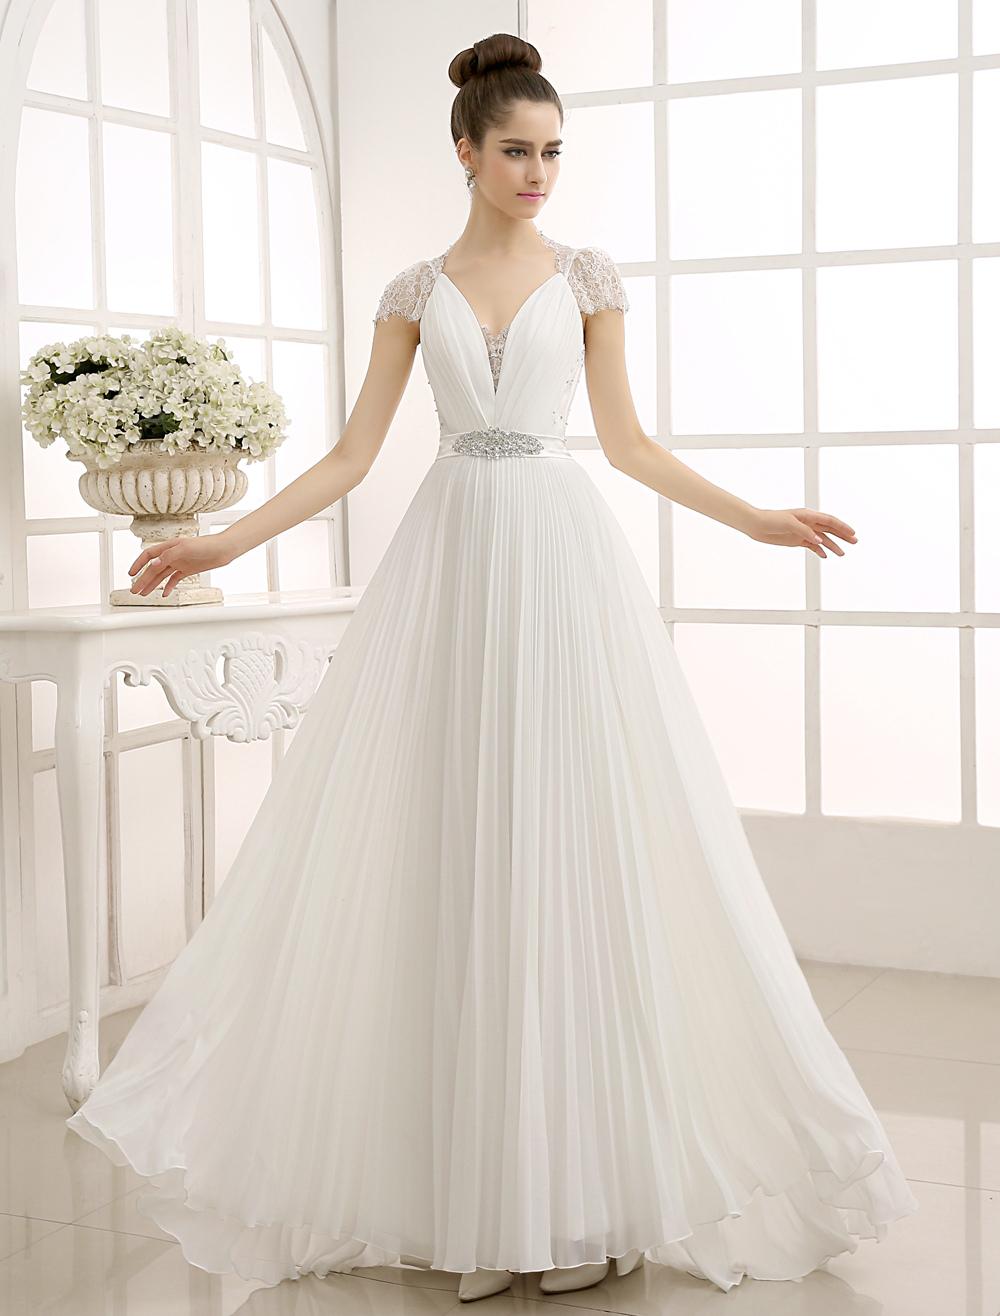 Etui-Brautkleid mit V-Ausschnitt - Etui-Stil - flanevo